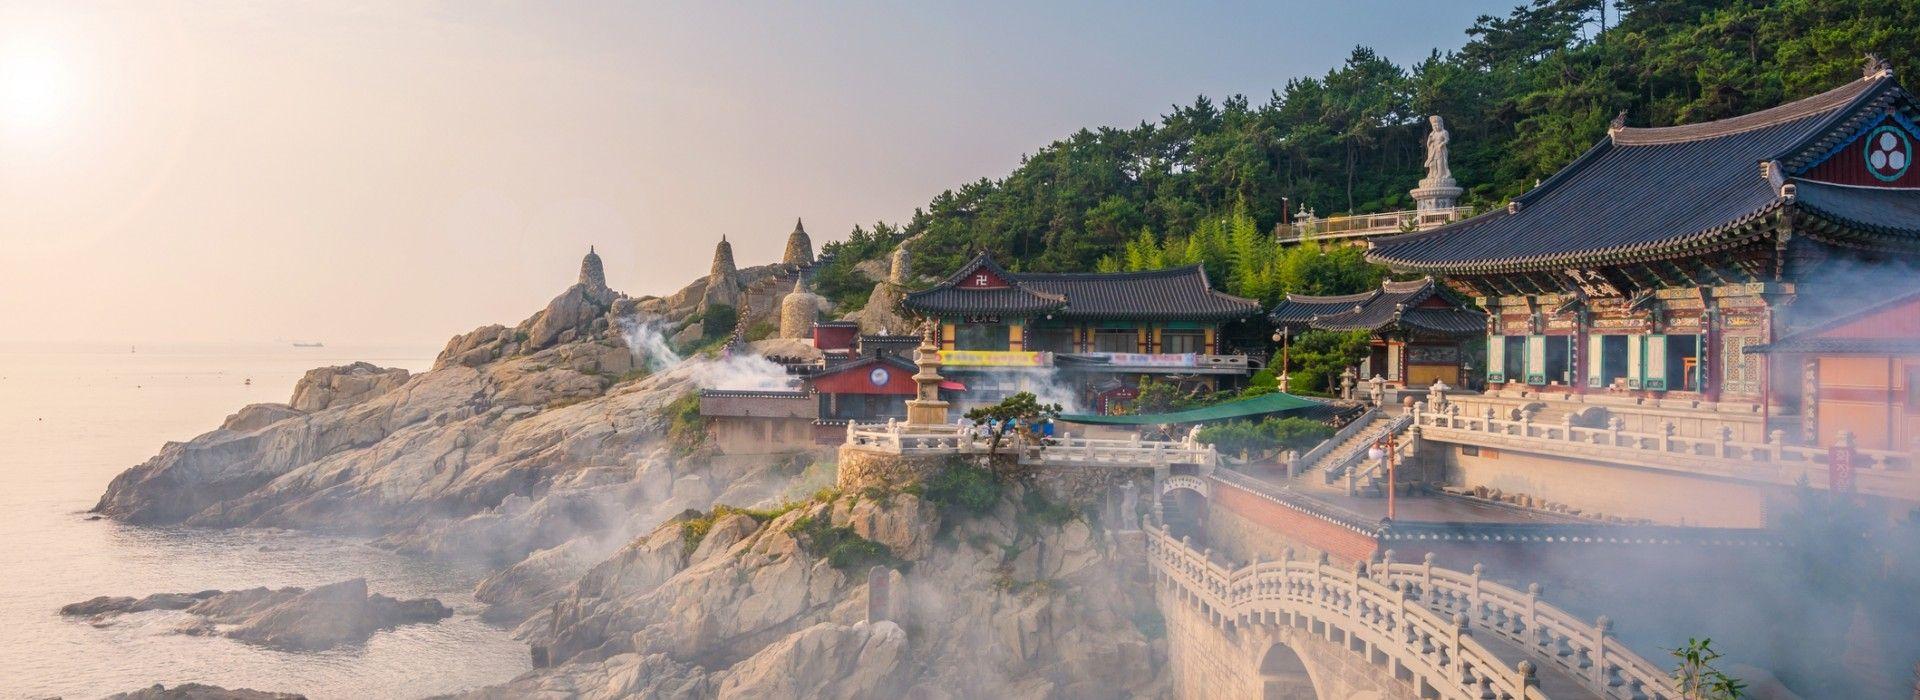 Explorer Tours in South Korea